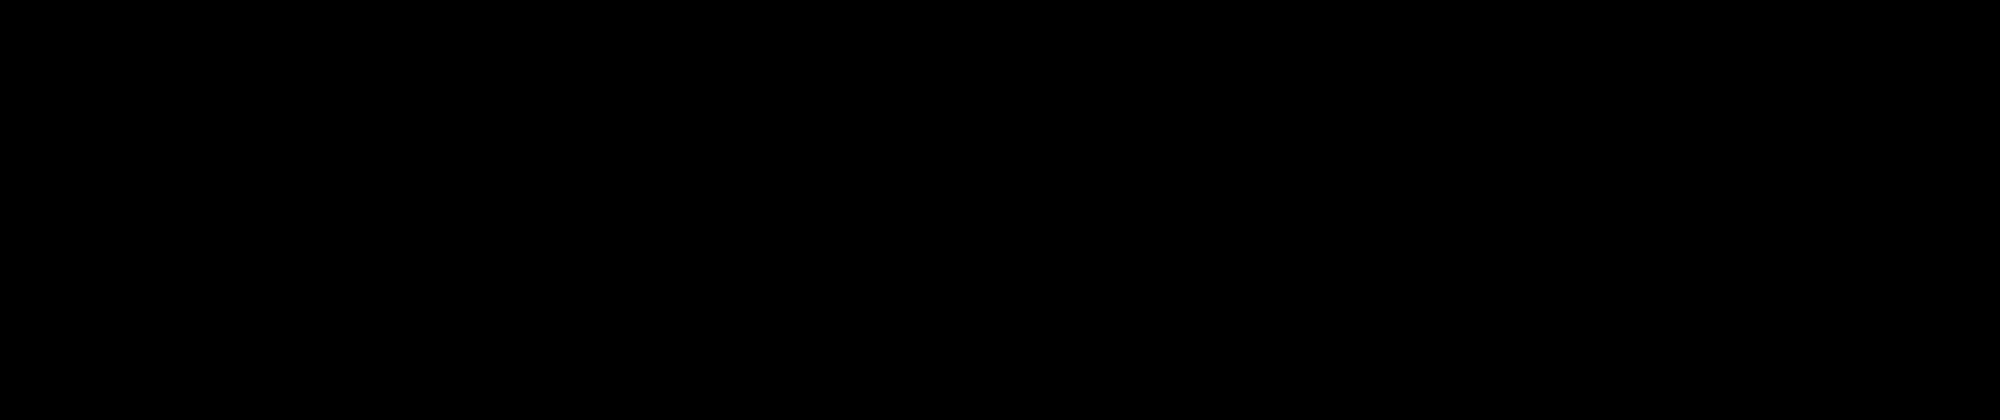 2000px-Listerine_logo.png